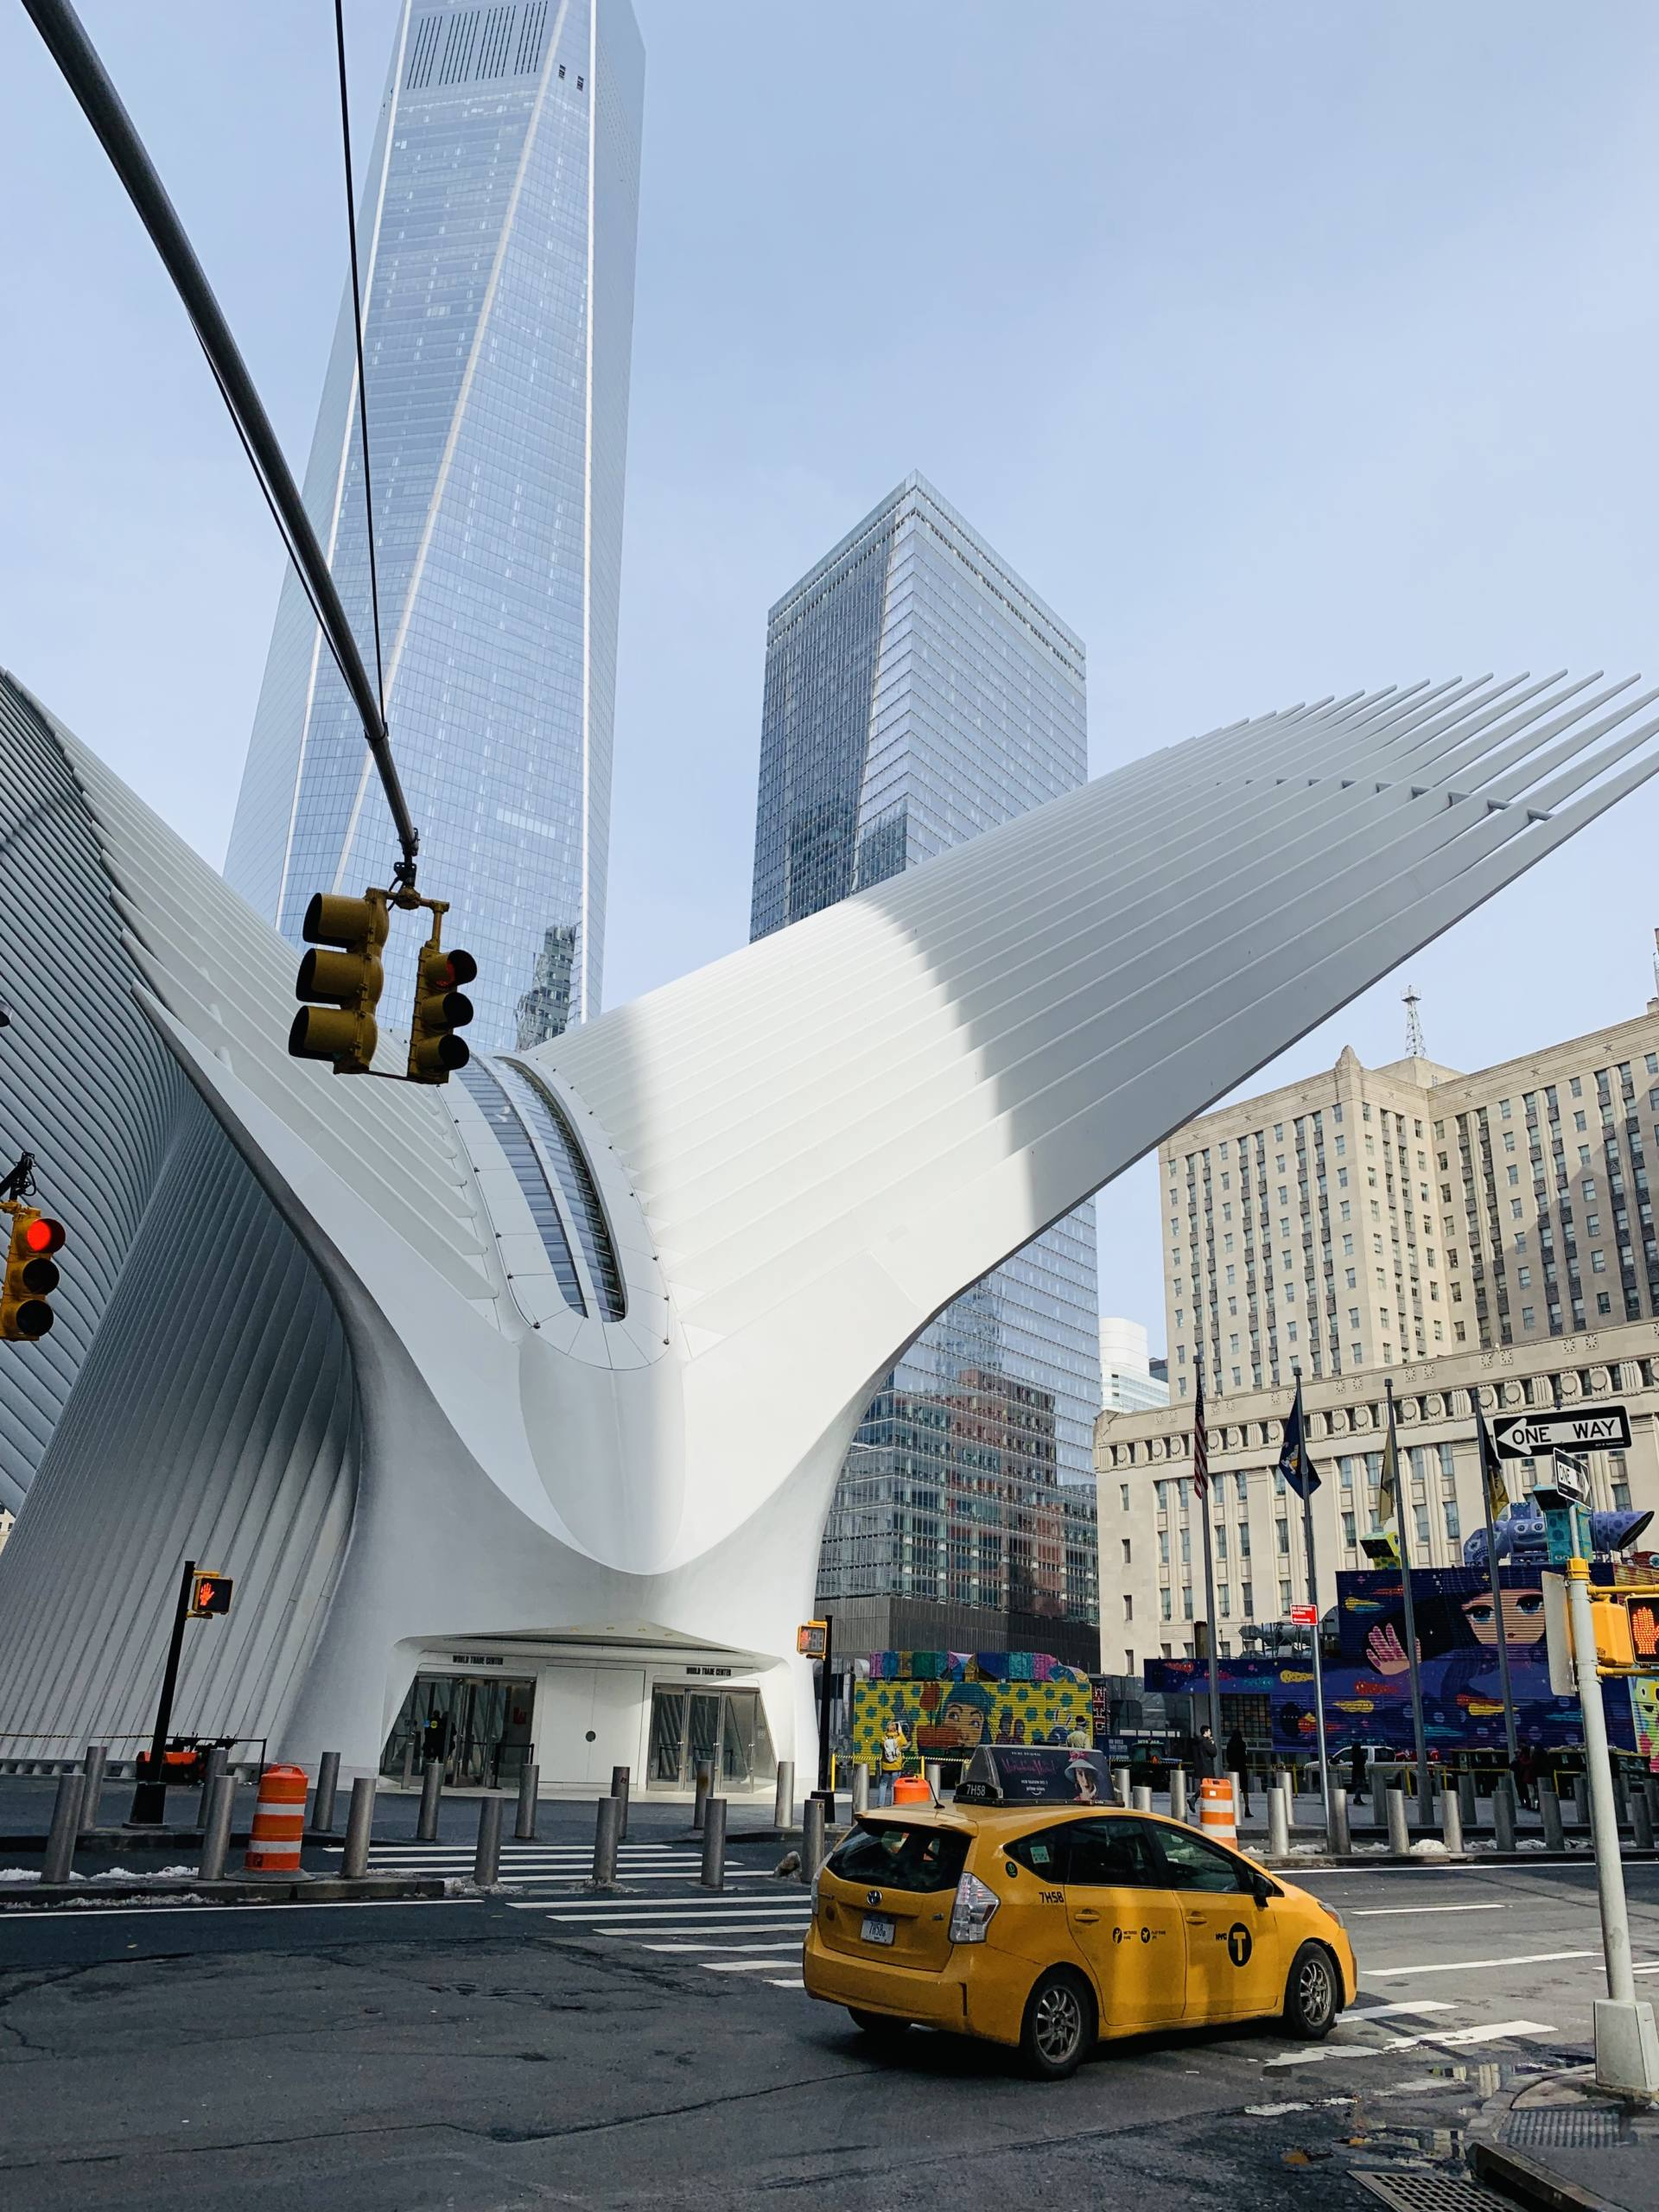 oculus one world trade center New York